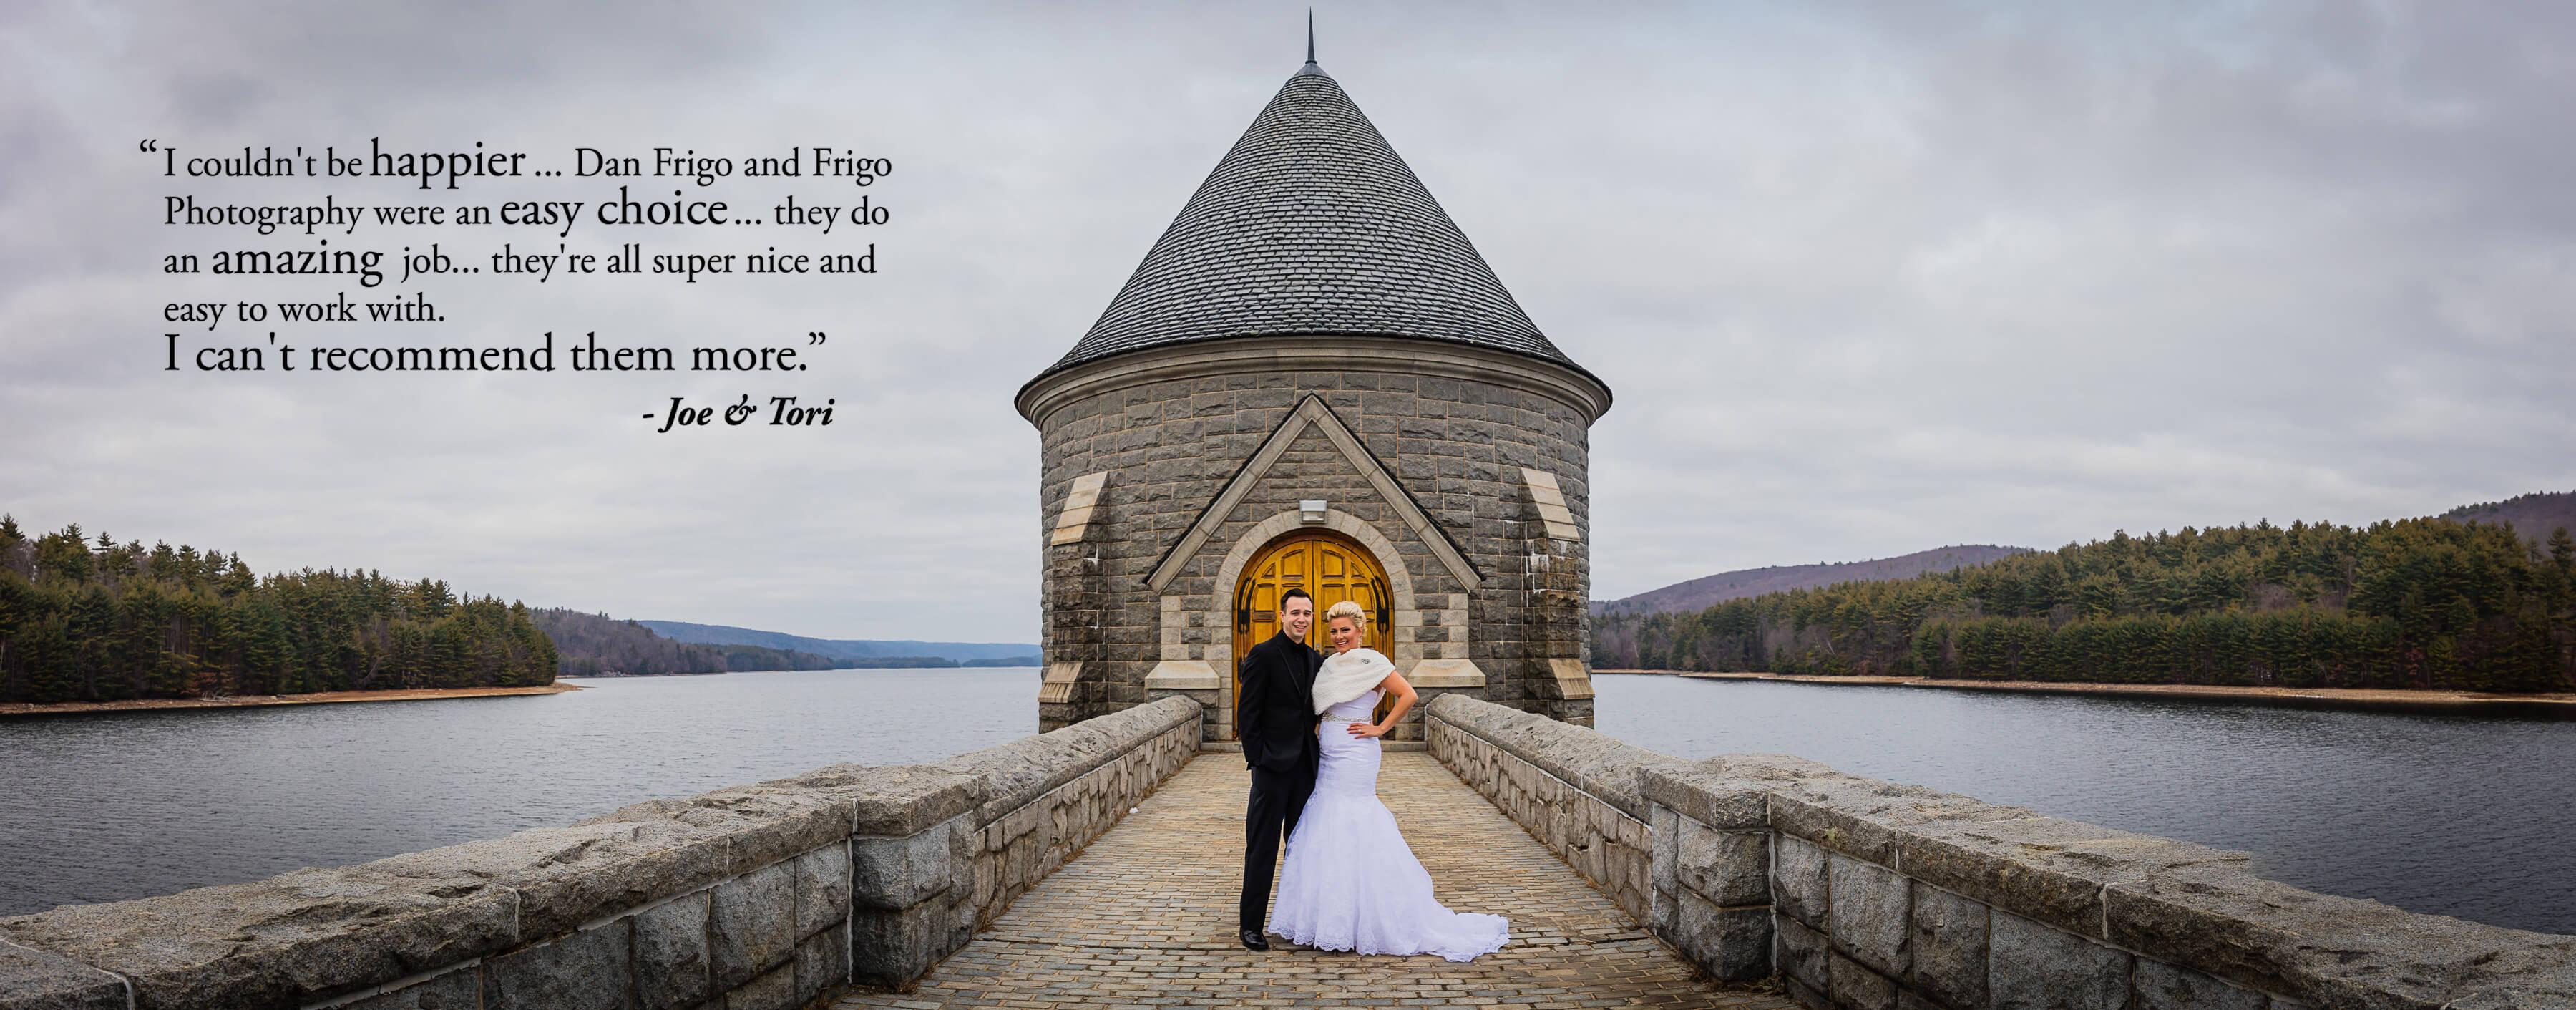 Saville Dam Barkhamsted Reservoir wedding photo